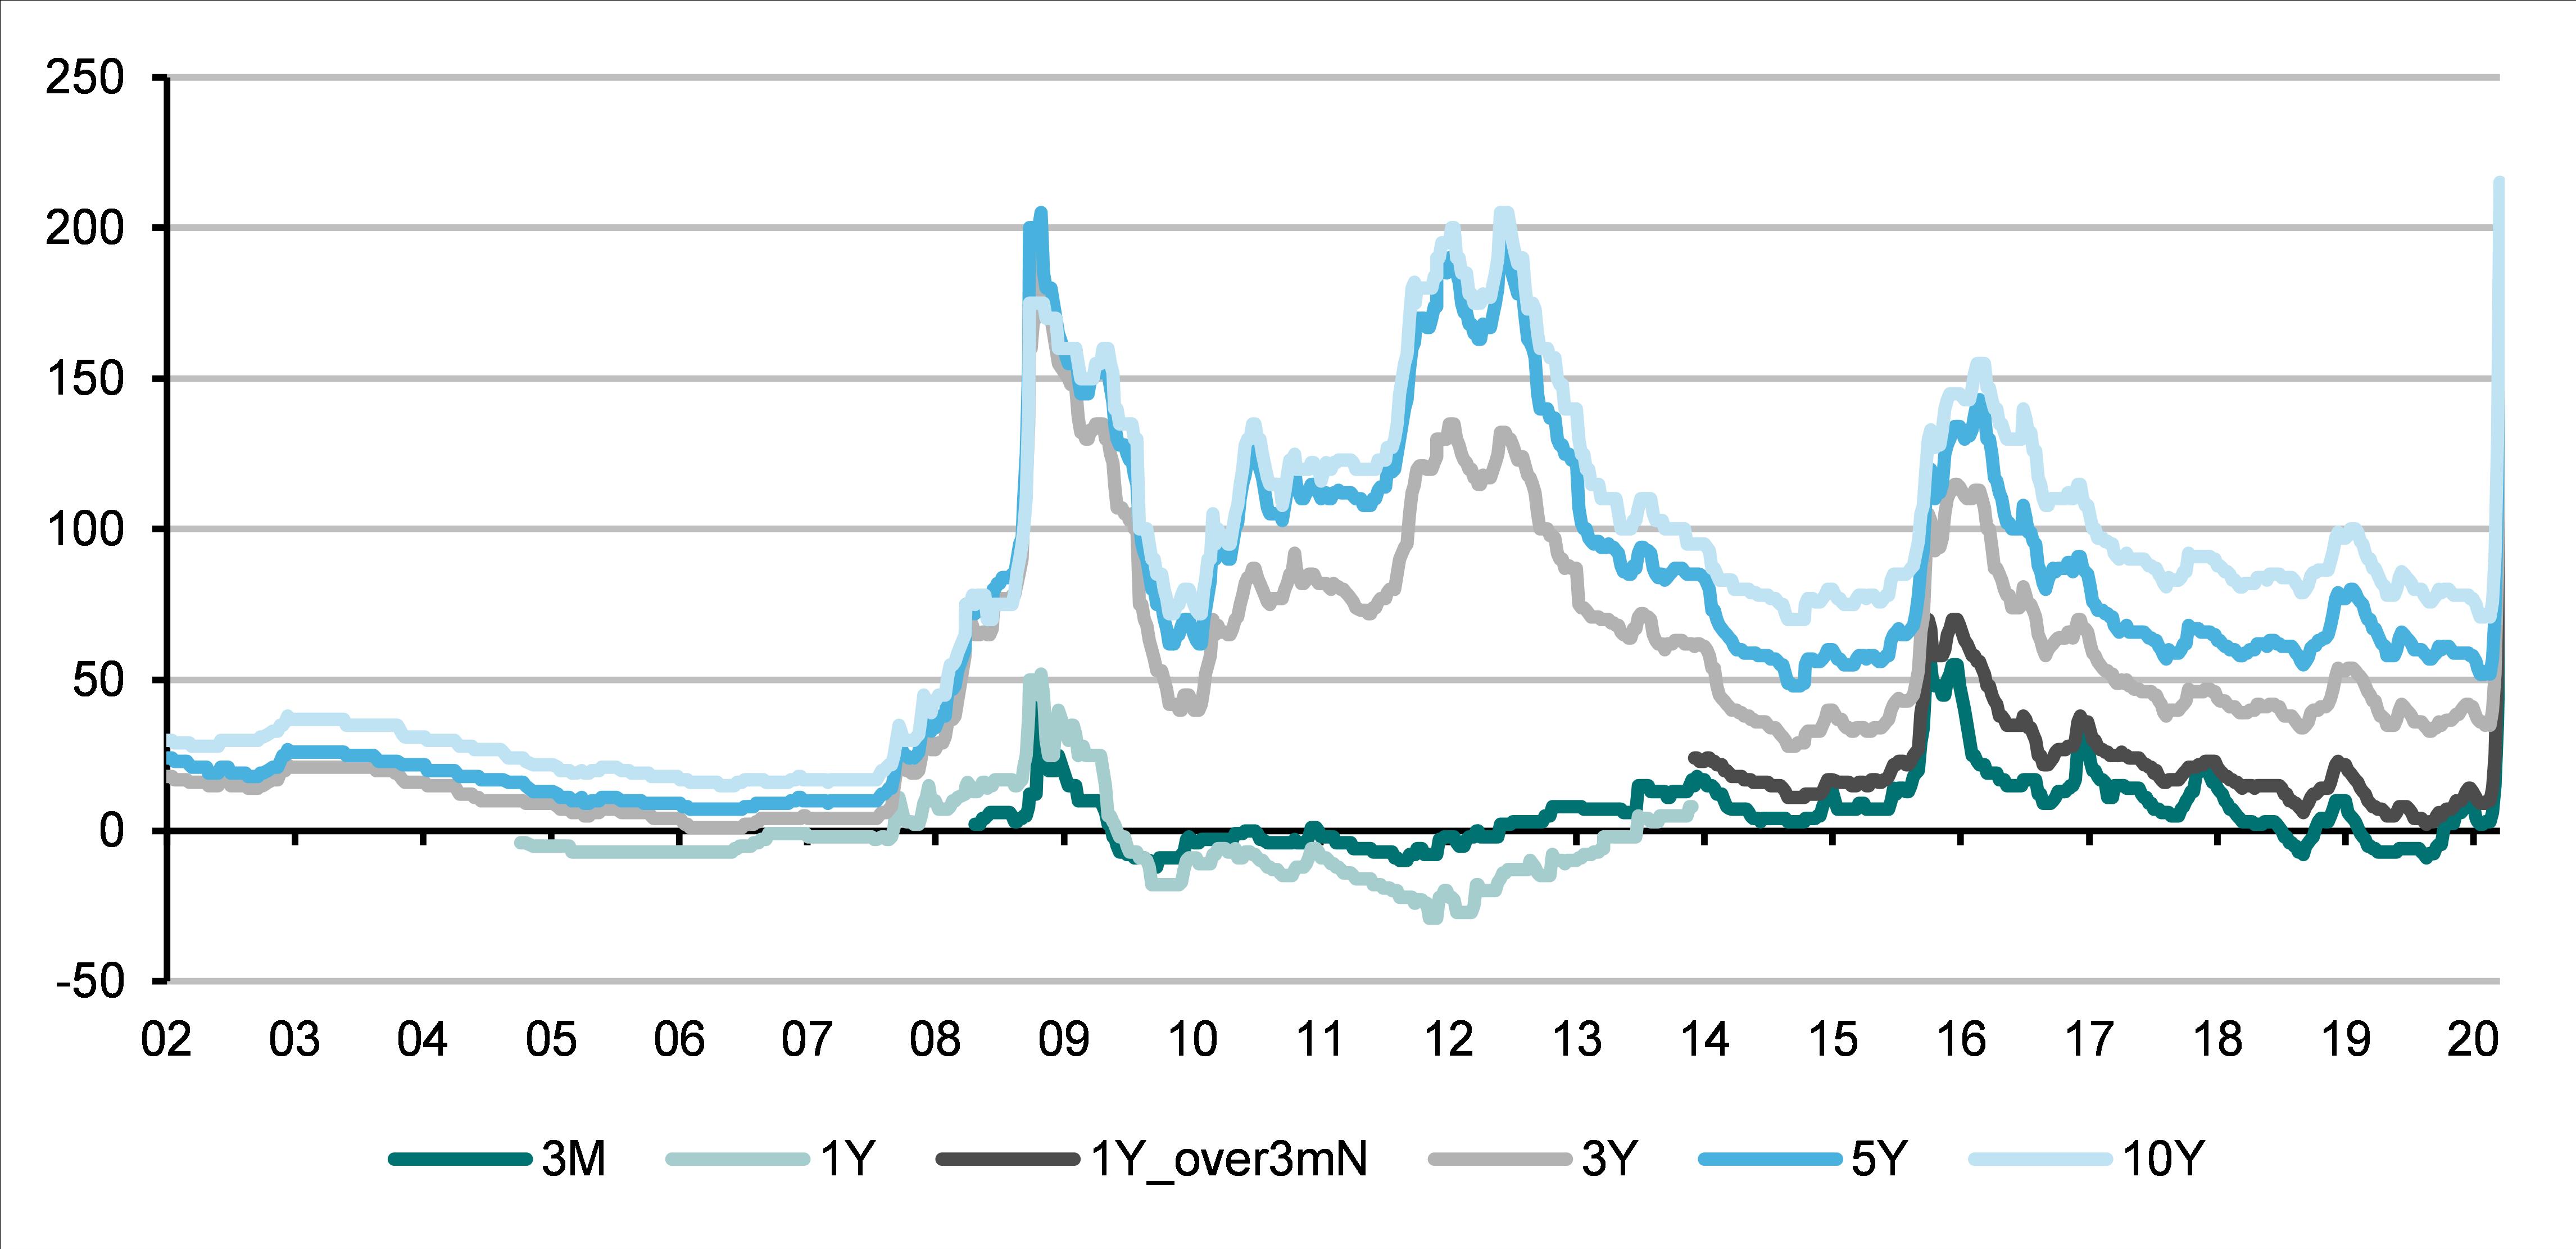 Credit spreads of various maturities for Norwegian banks